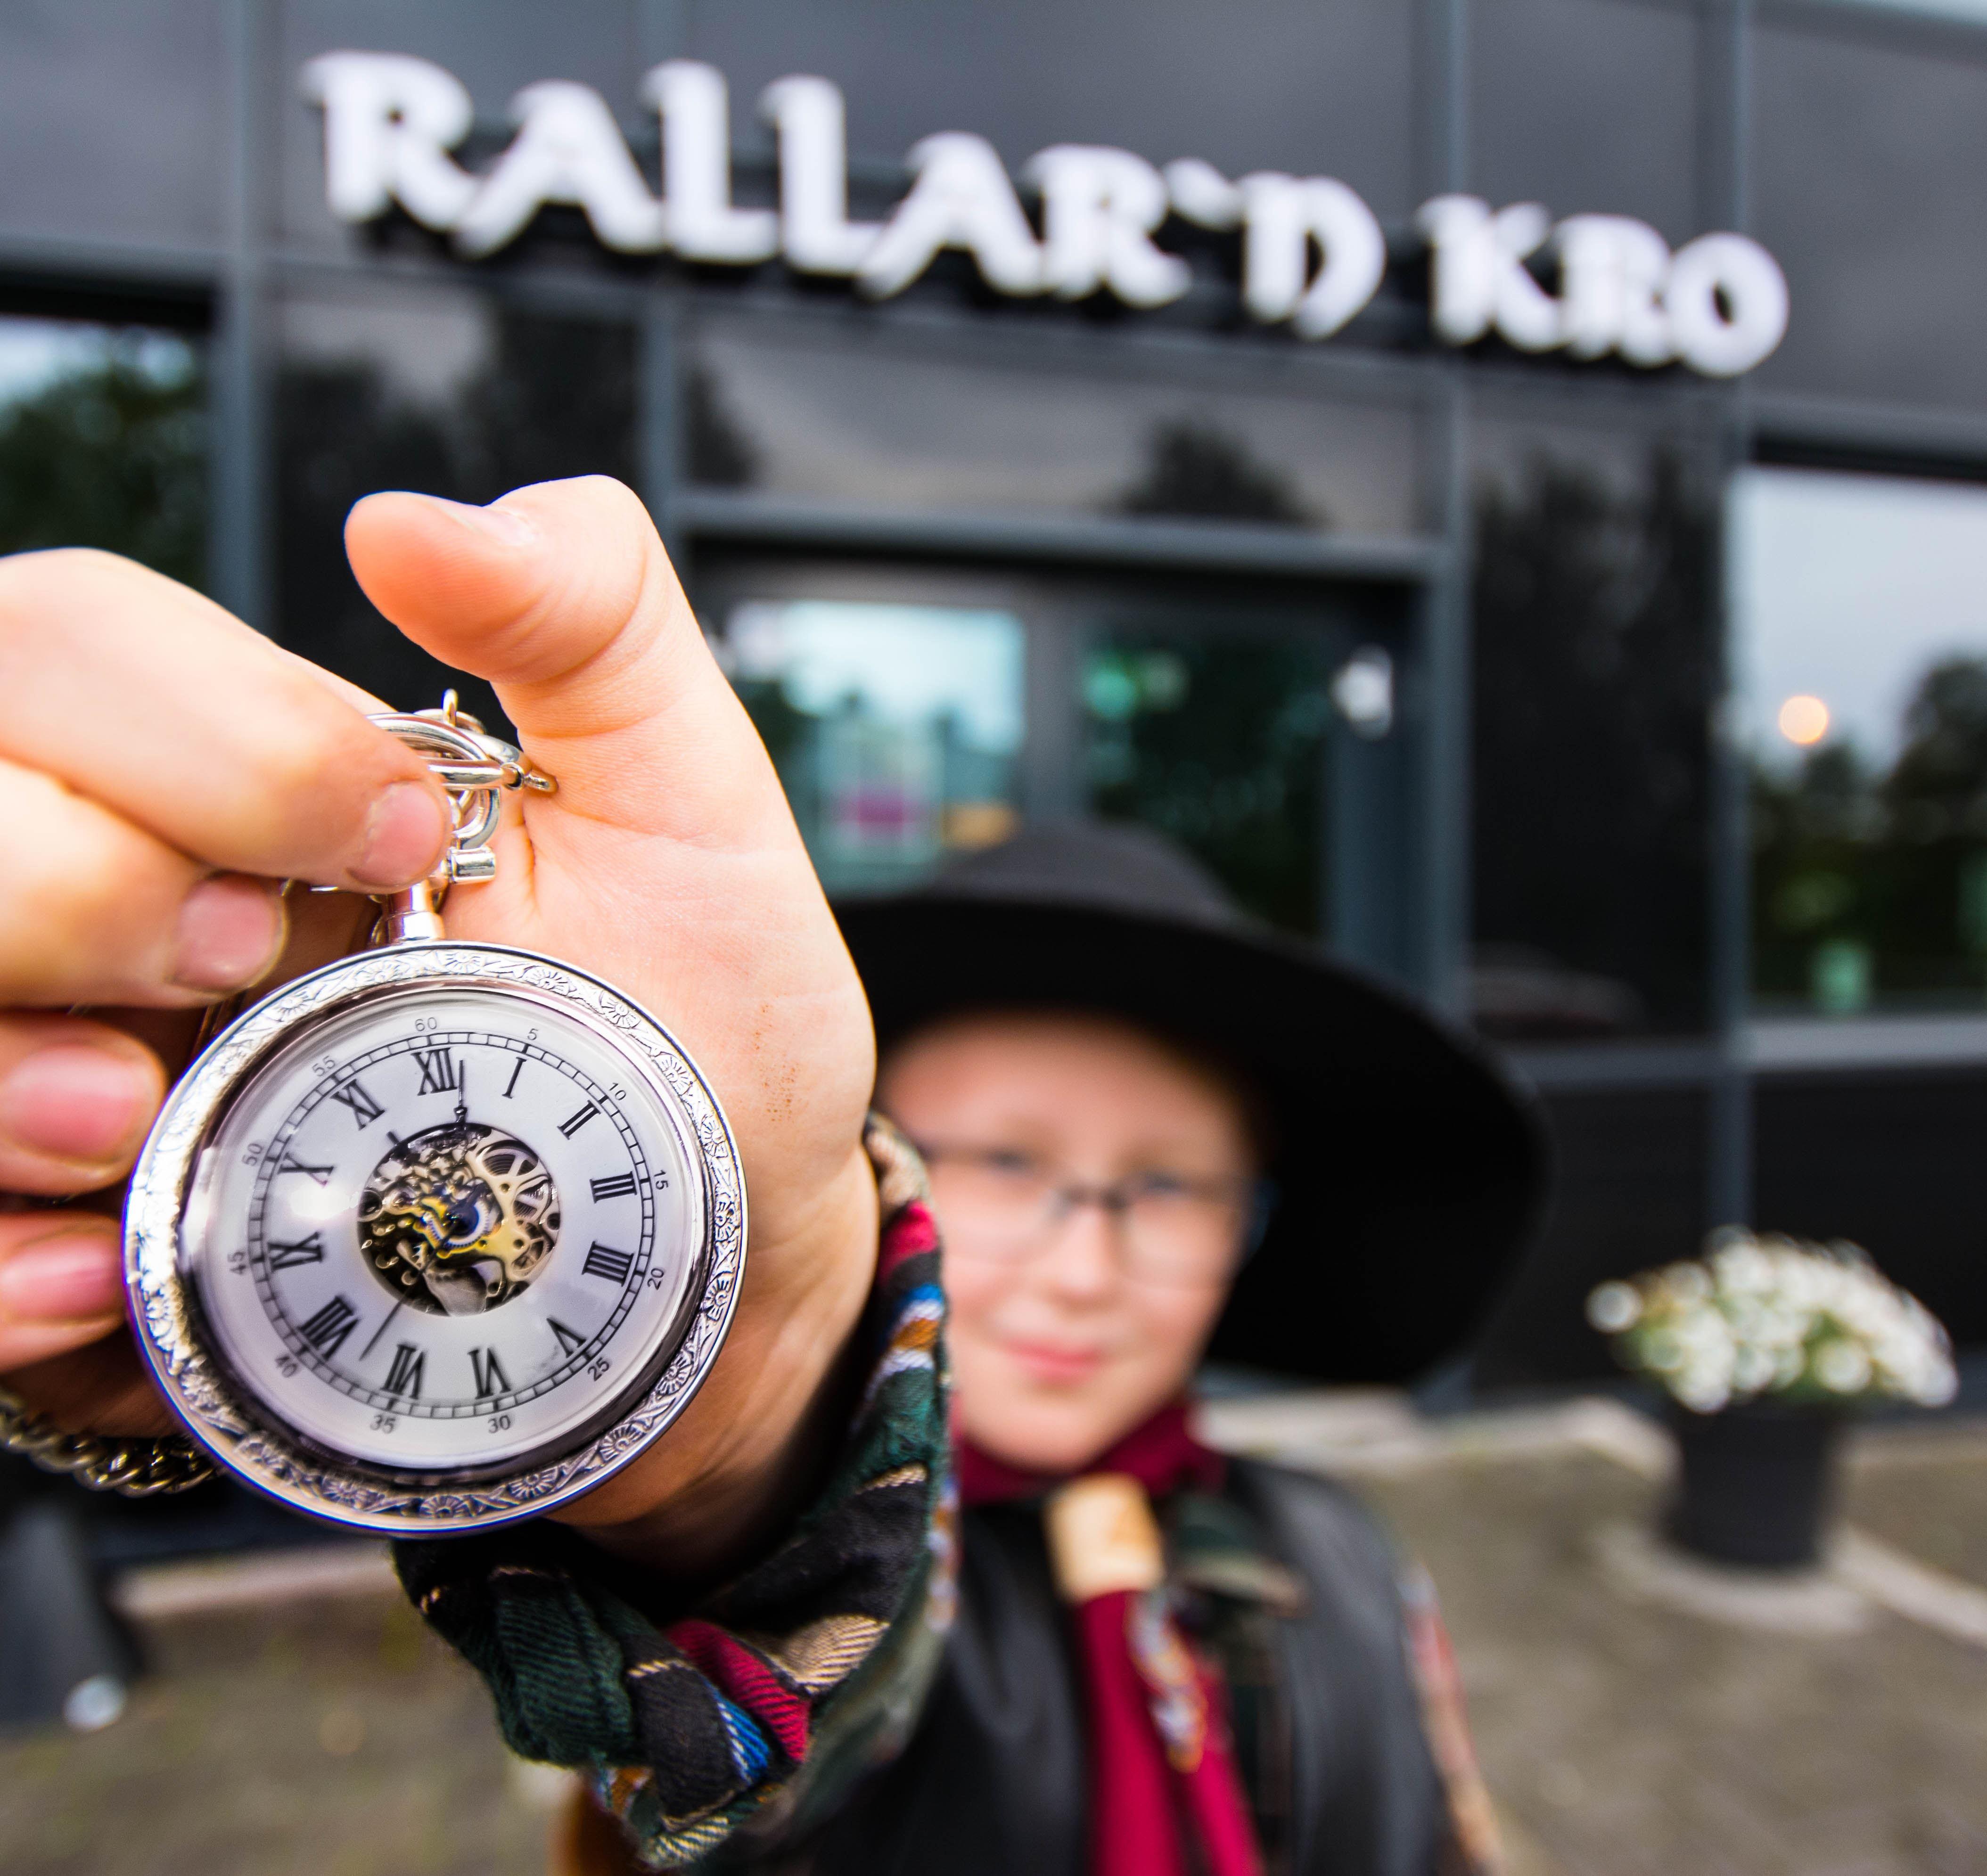 © Quality Grand Royal Hotel, Rallarn Pub og Kro, Quality Grand Royal Hotel Narvik